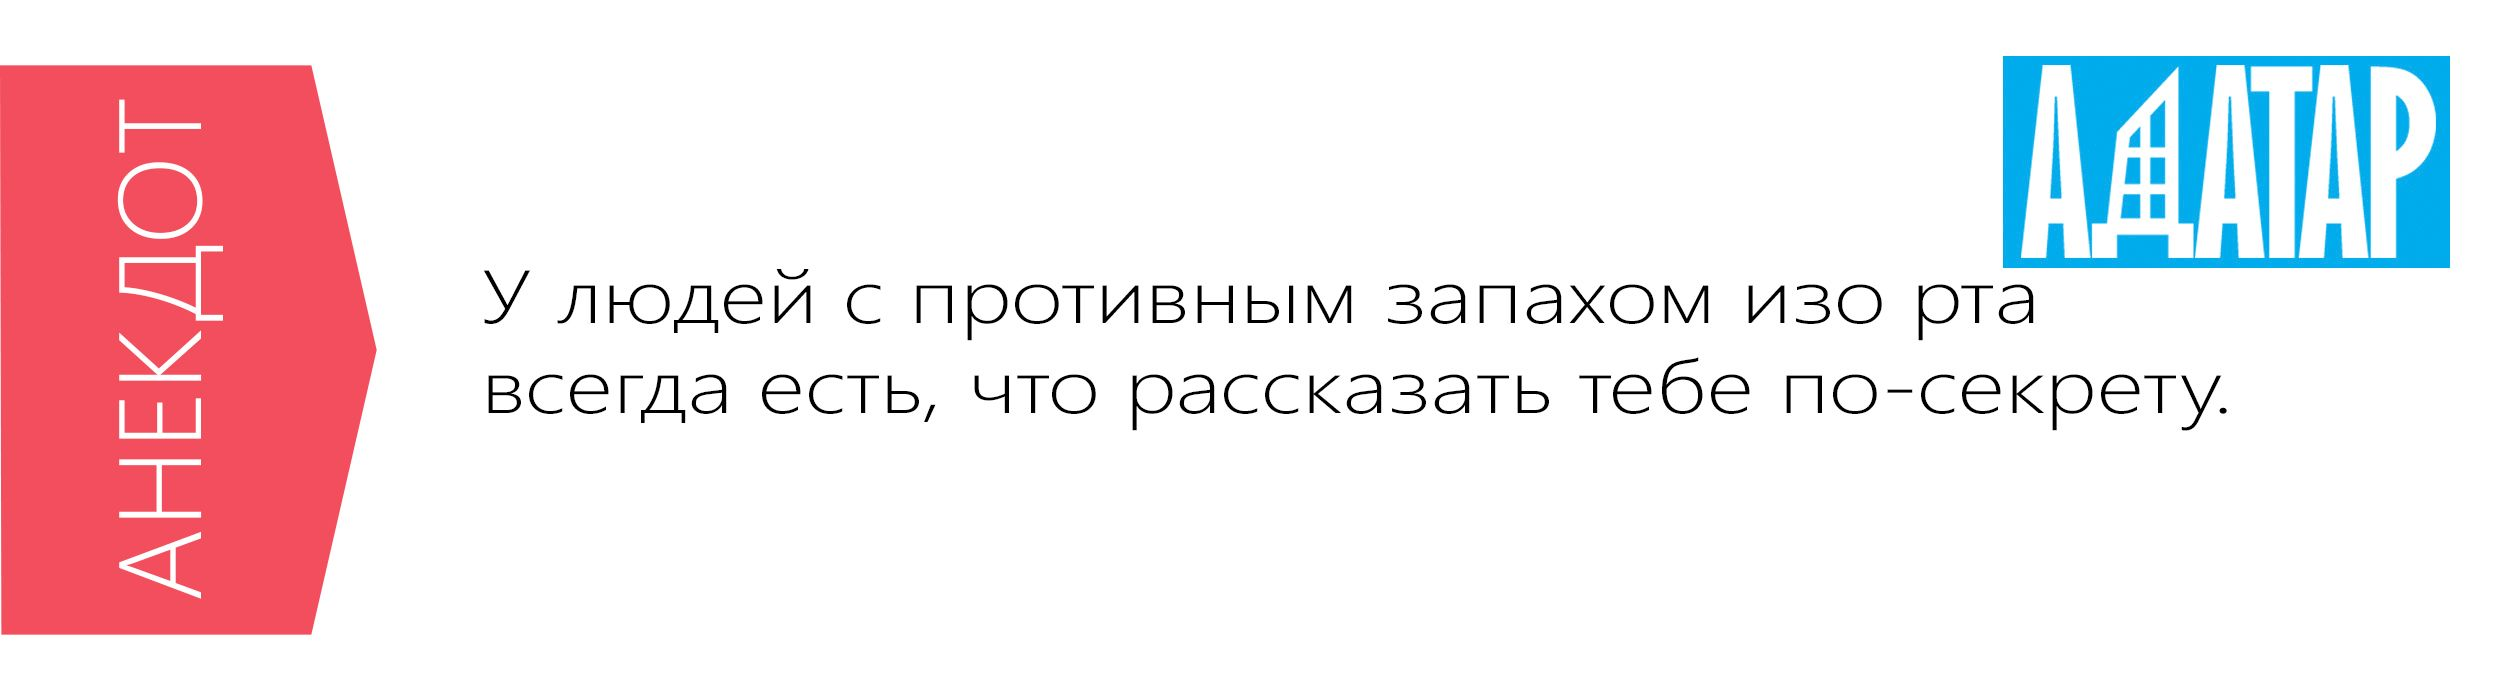 АНЕКДОТ 55.jpg